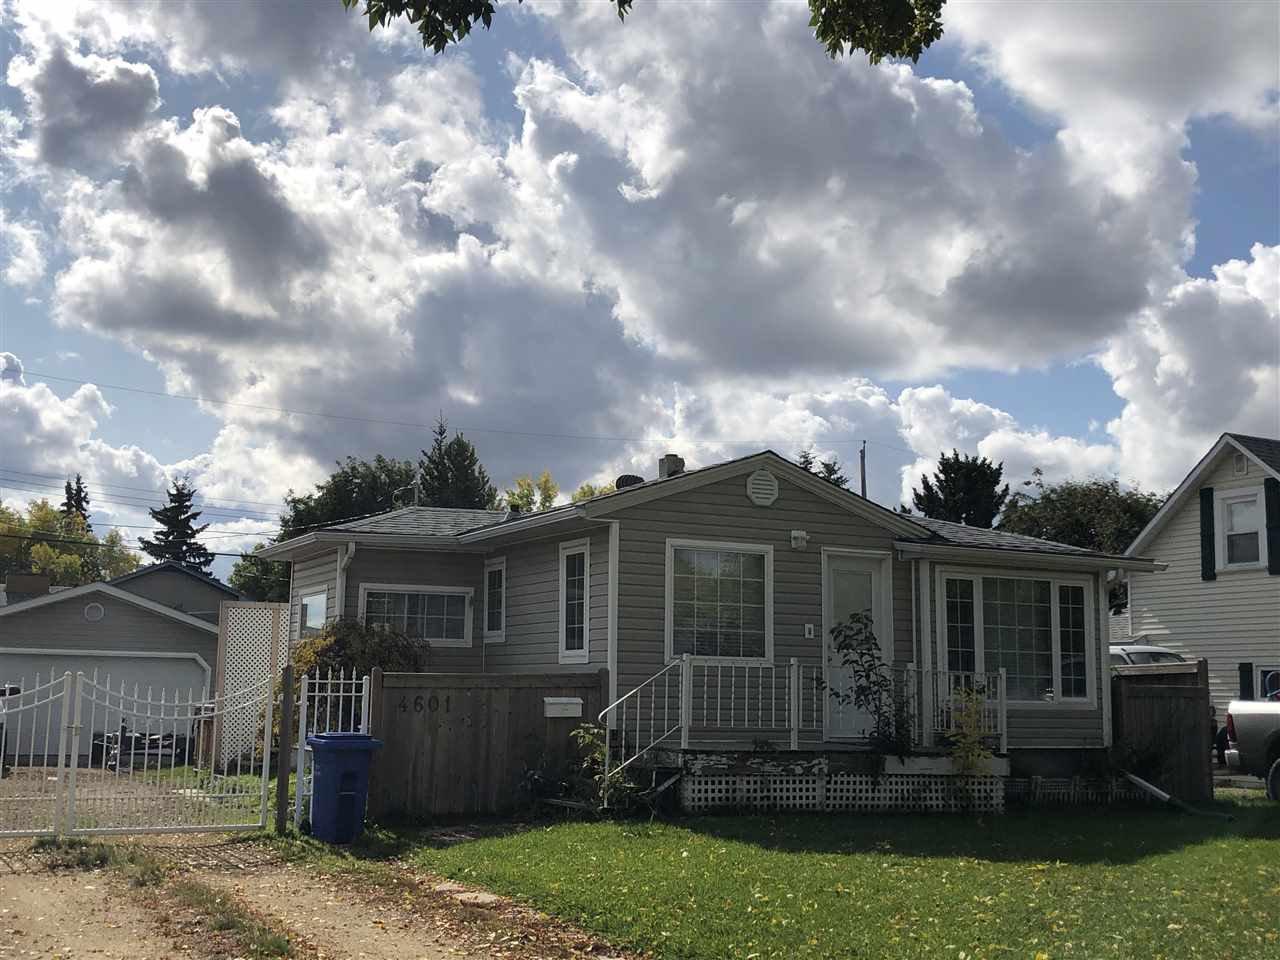 Main Photo: 4601 53 Avenue: Wetaskiwin House for sale : MLS®# E4174820